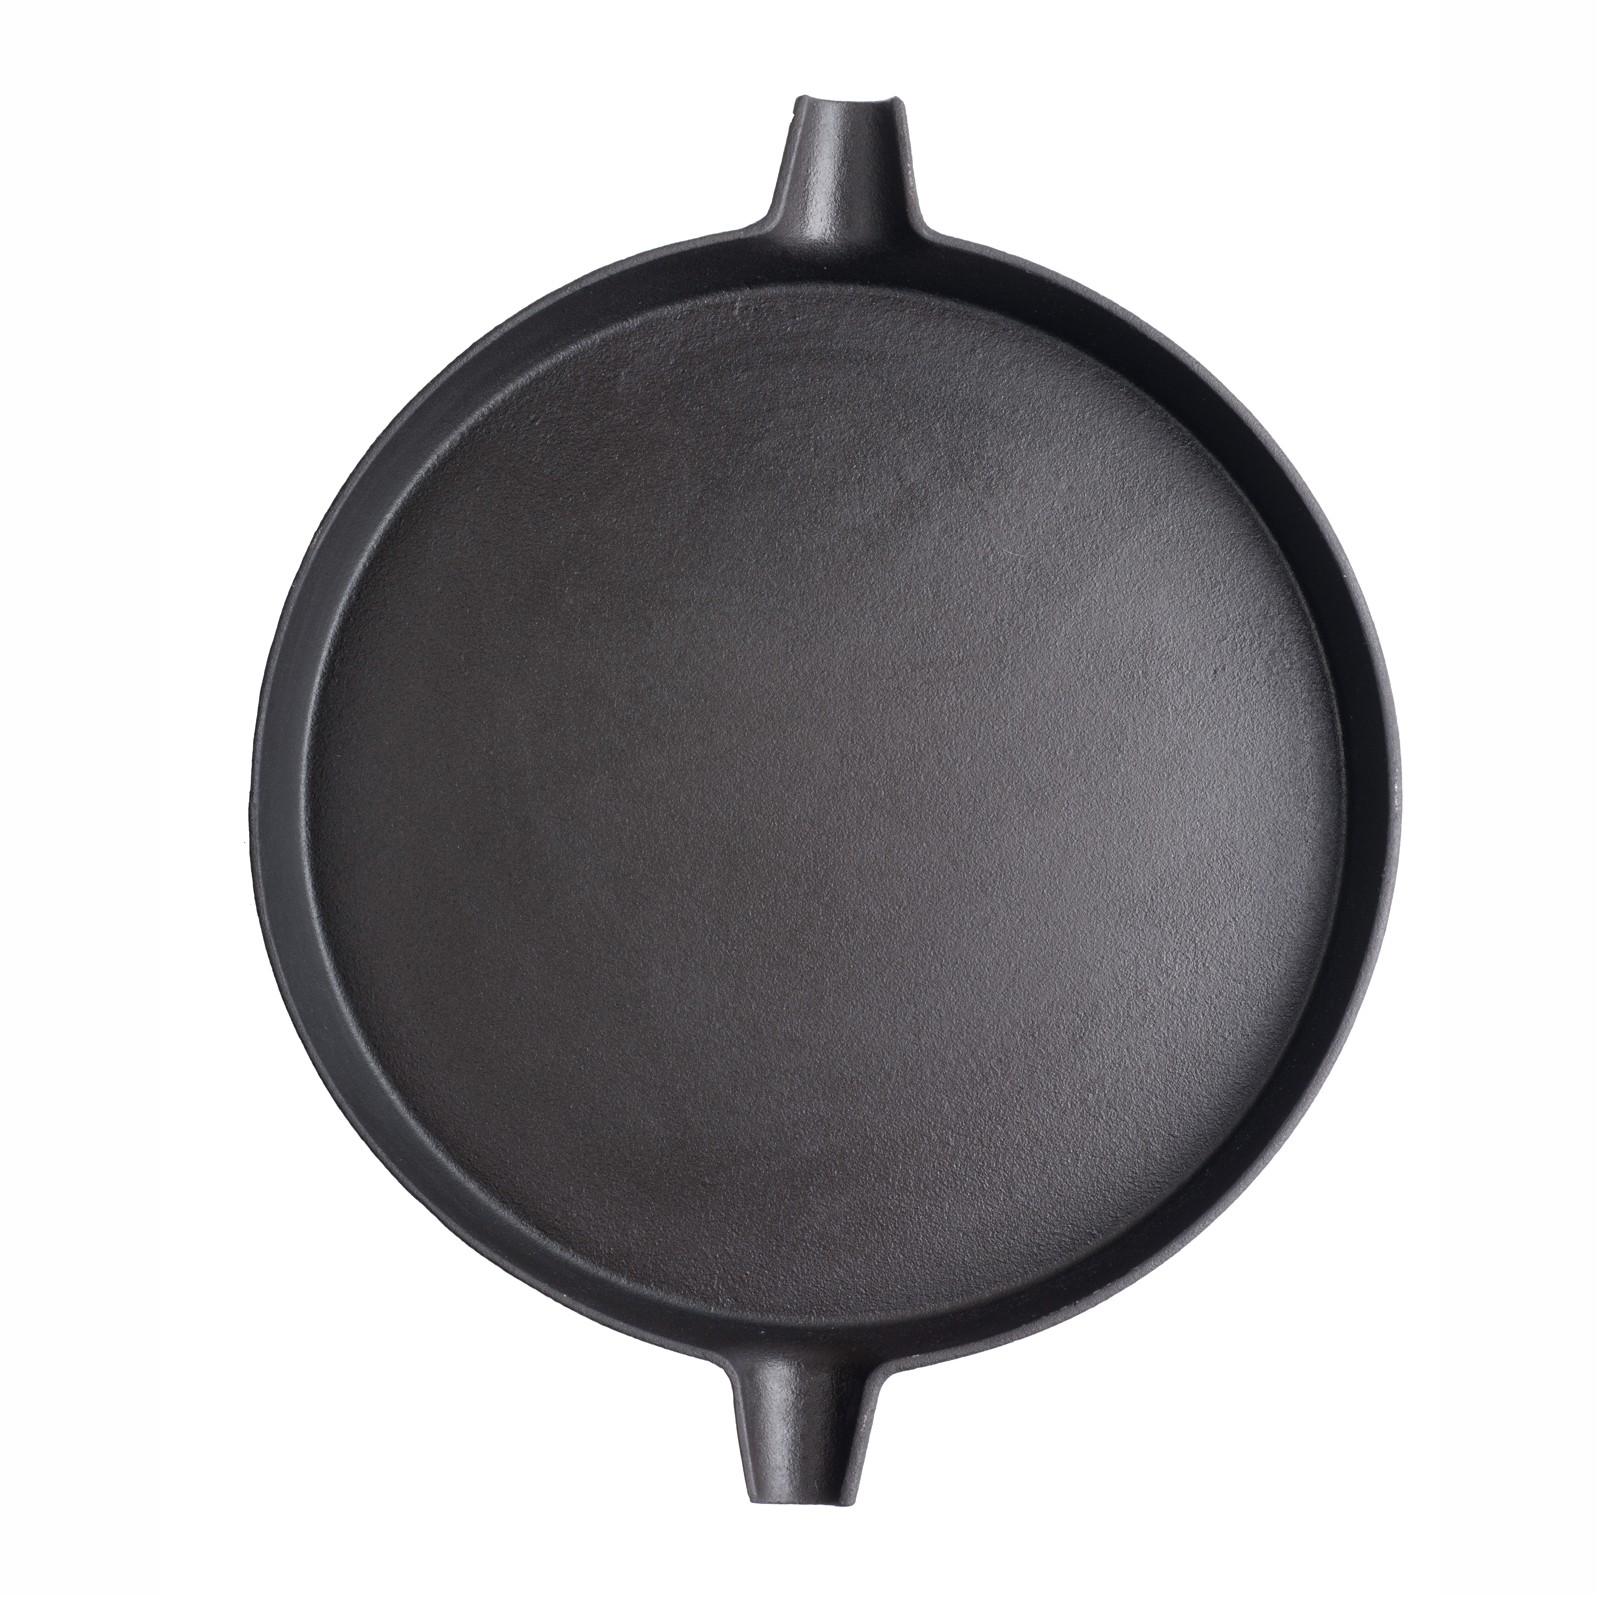 tepro kugelgrill gusspfanne grill einleger guss pfanne f r rost in rost system ebay. Black Bedroom Furniture Sets. Home Design Ideas